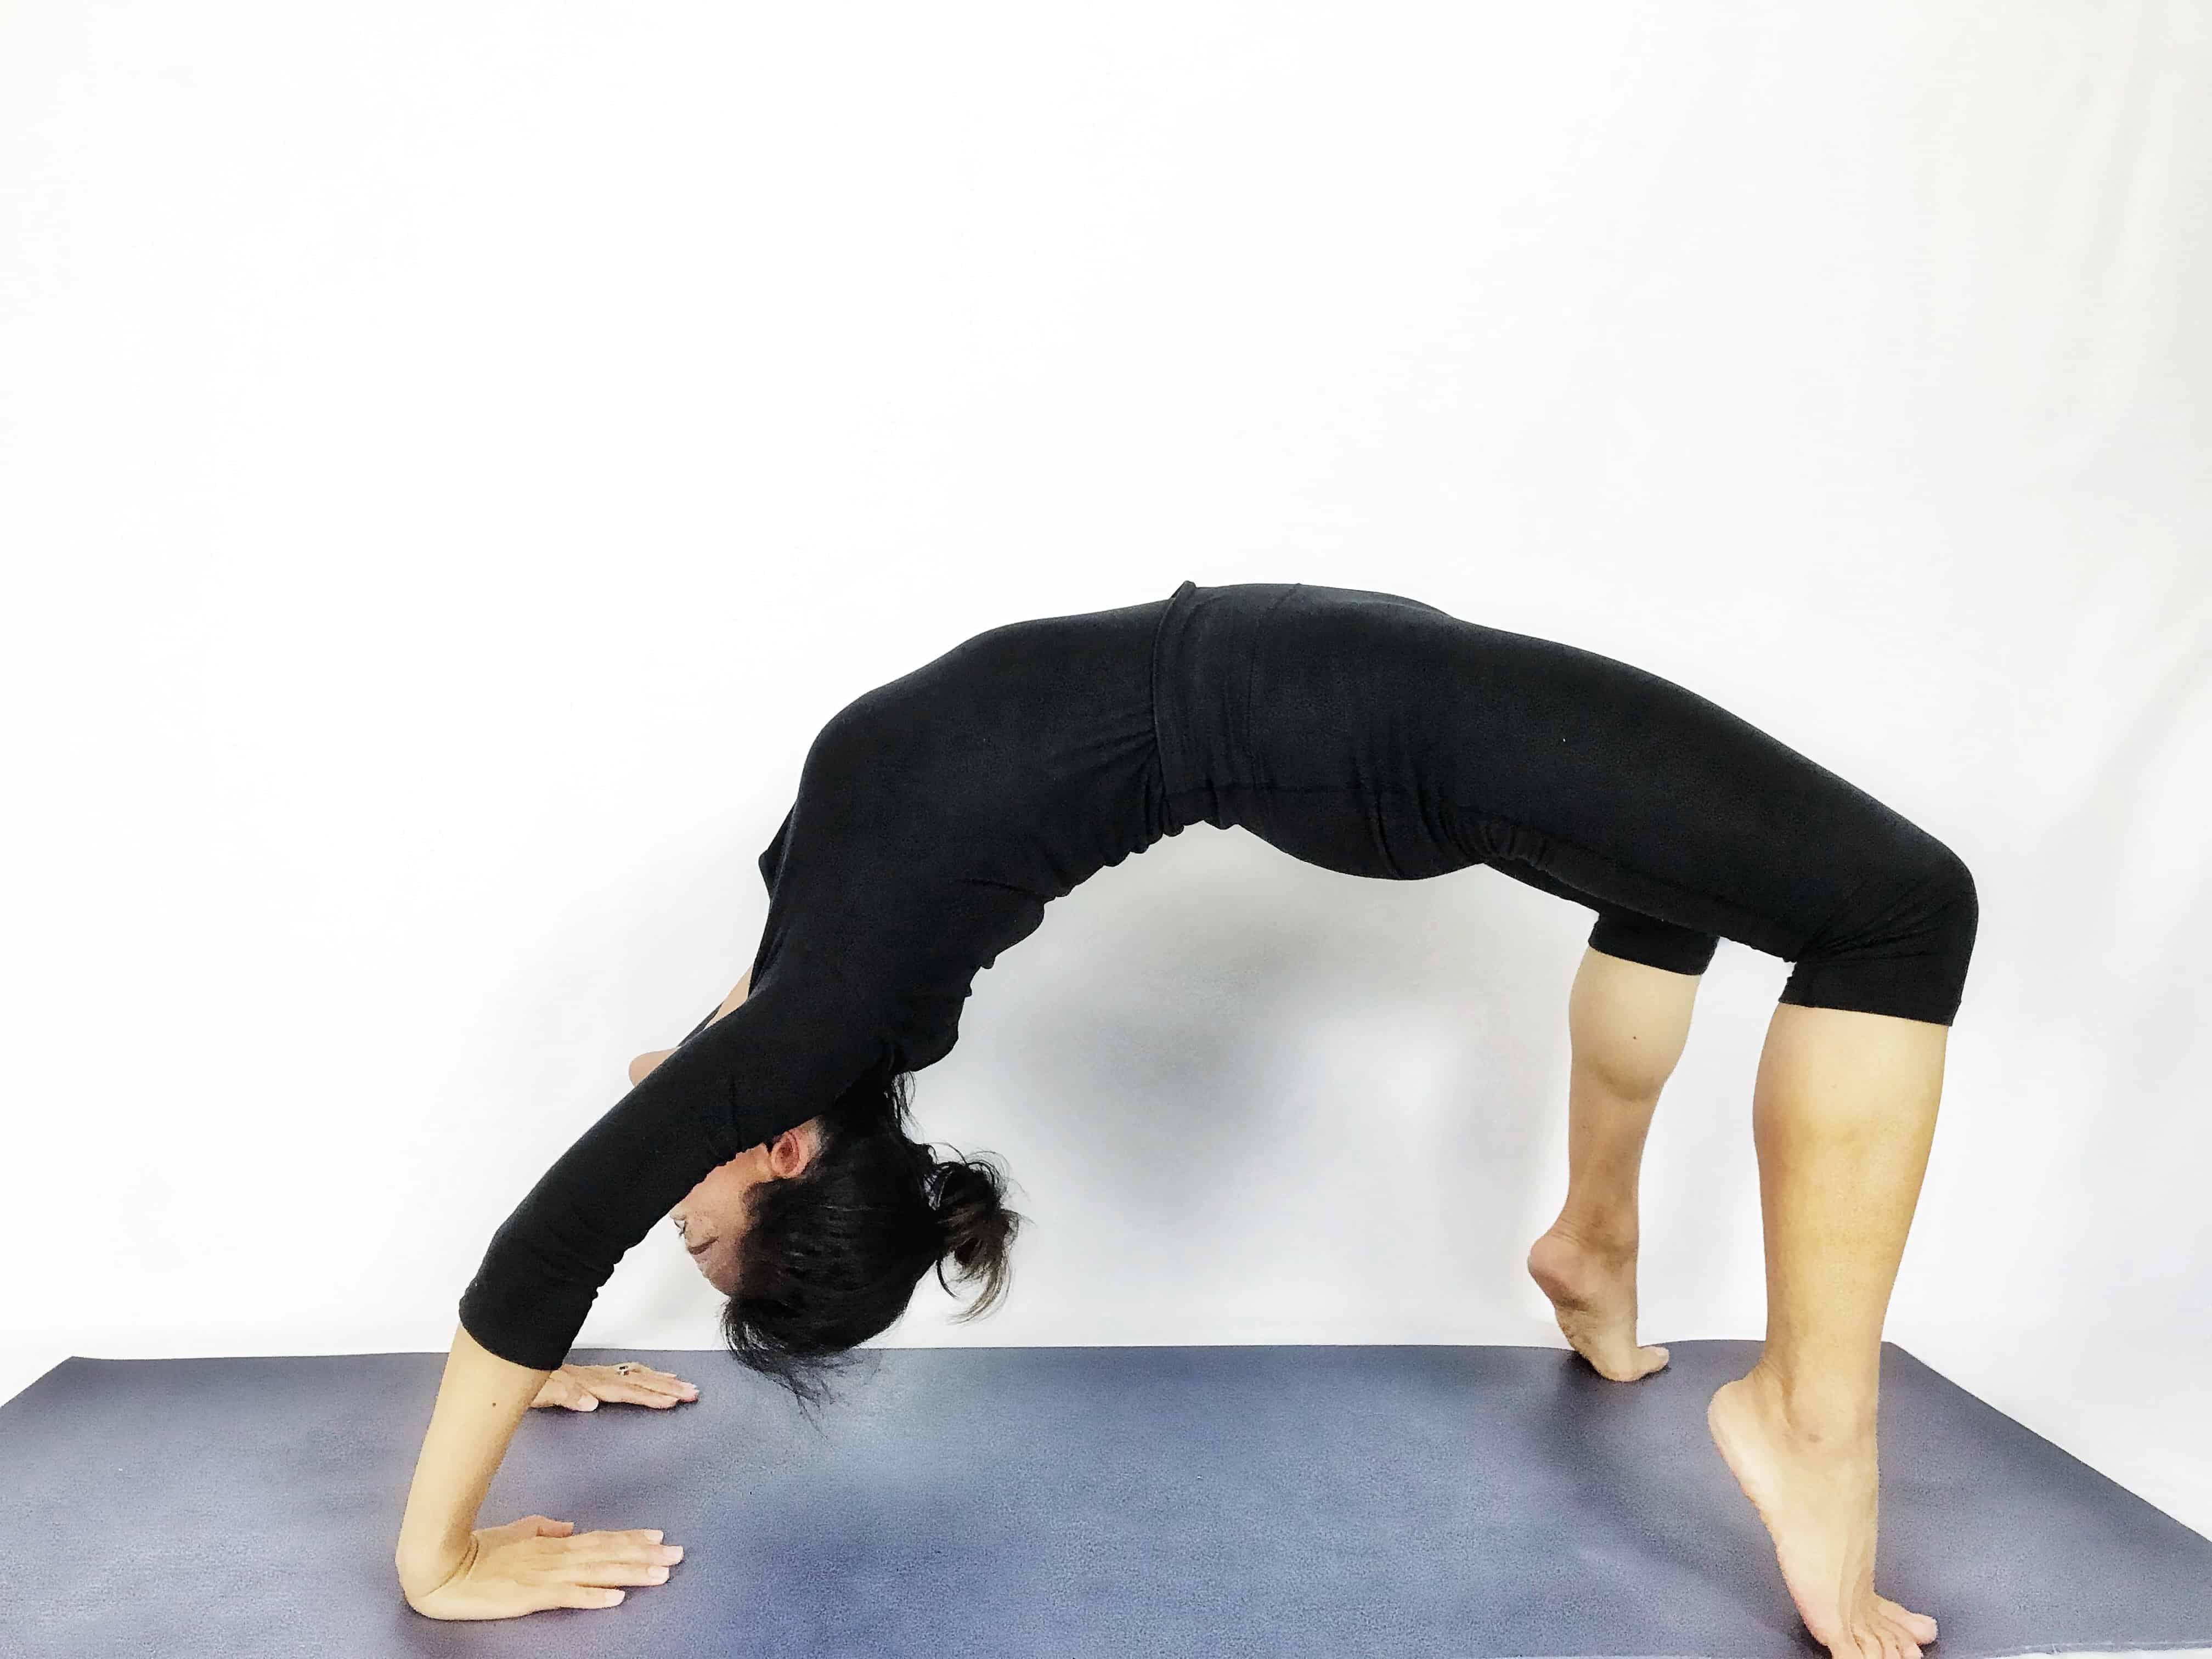 Wheel inversion yoga pose